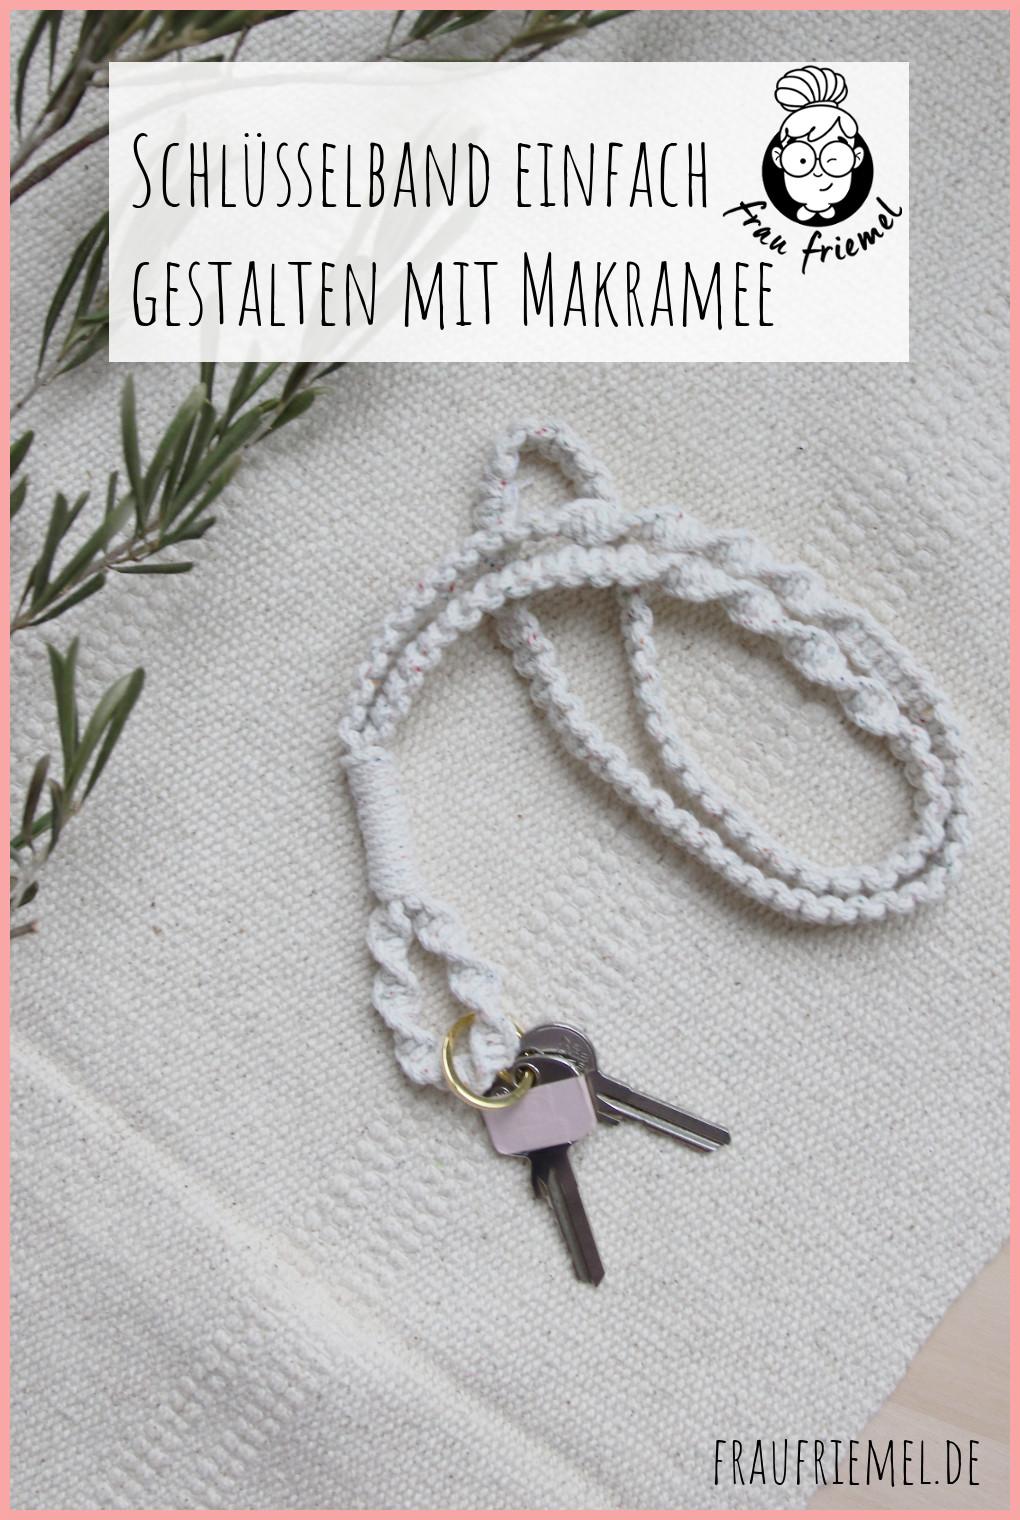 Makramee-Schlüsselband selbst gestalten auf Pinterest merken